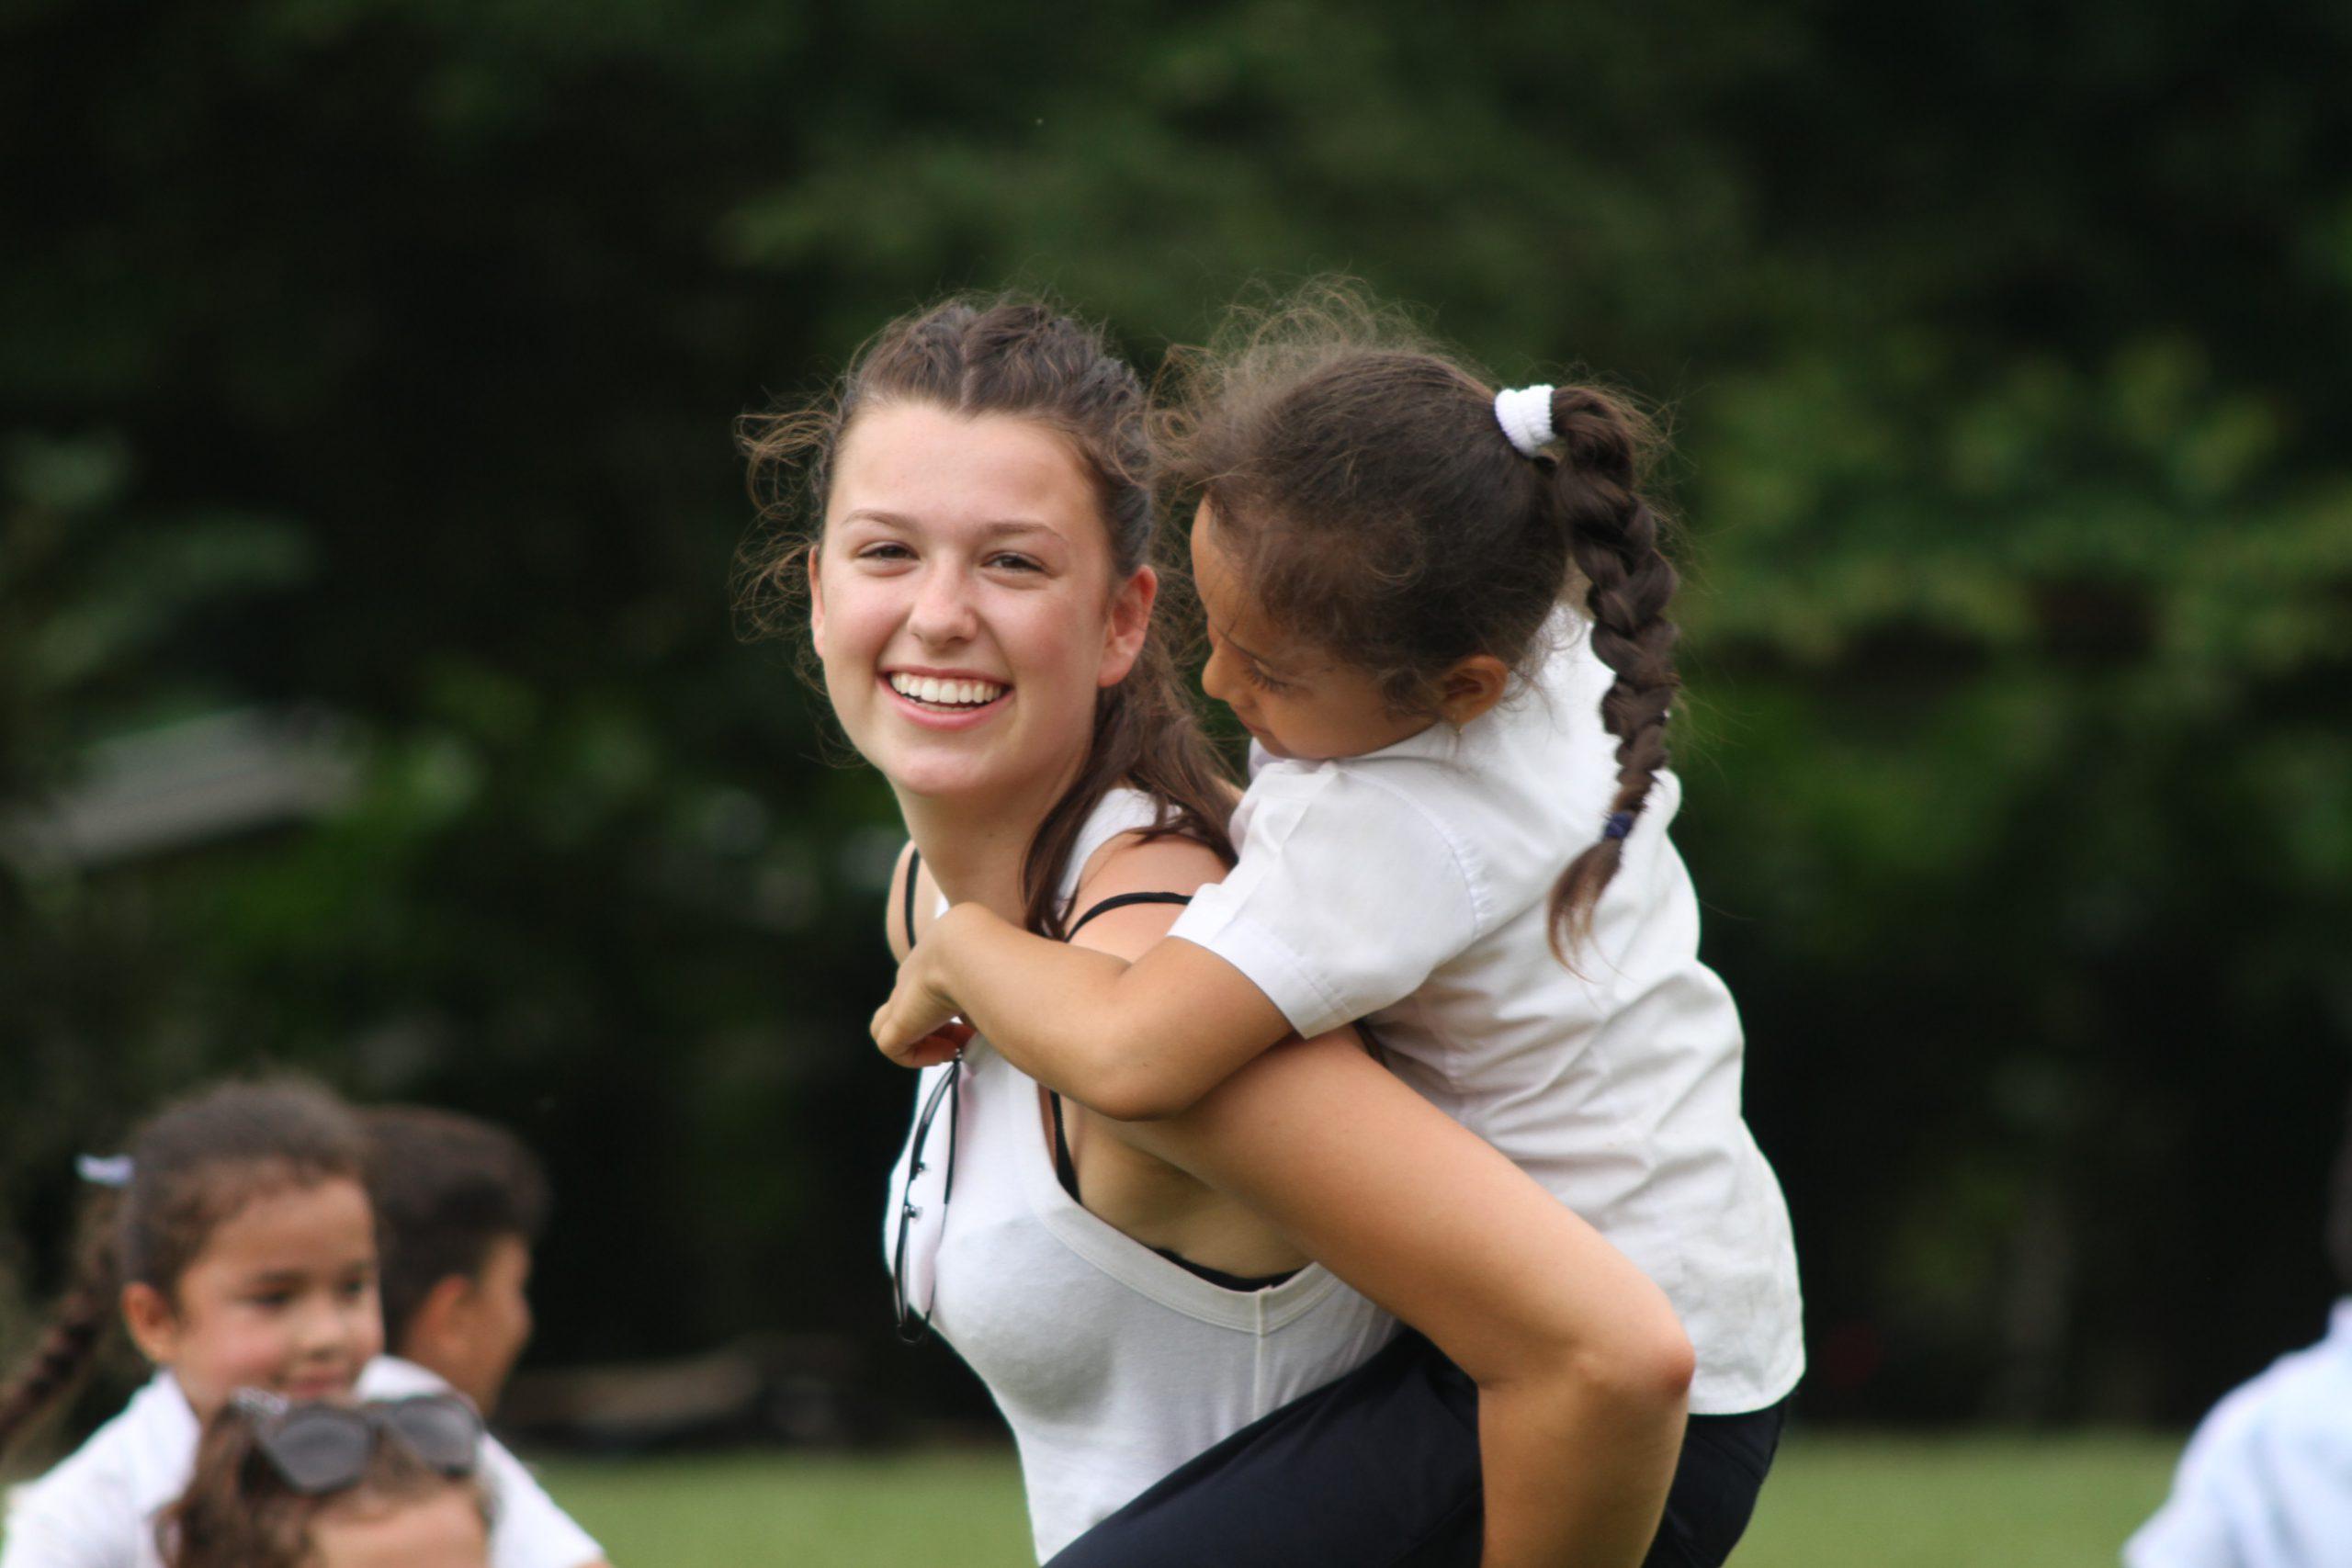 school_expedition_costa_rica_scuba_piggyback_students